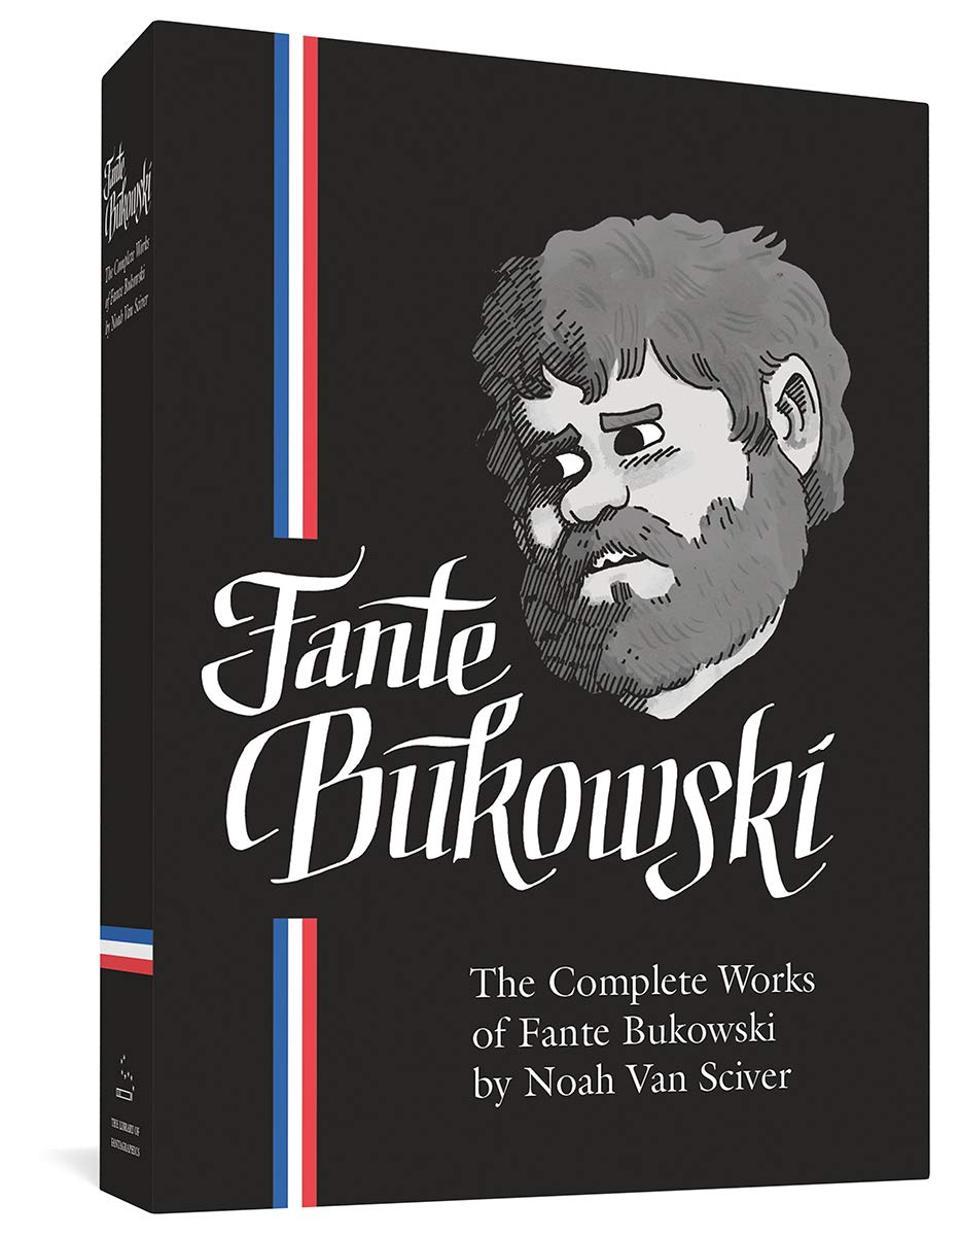 Fanta Bukowski Noah Van Sciver Fantagraphics 2020 humorous graphic novel